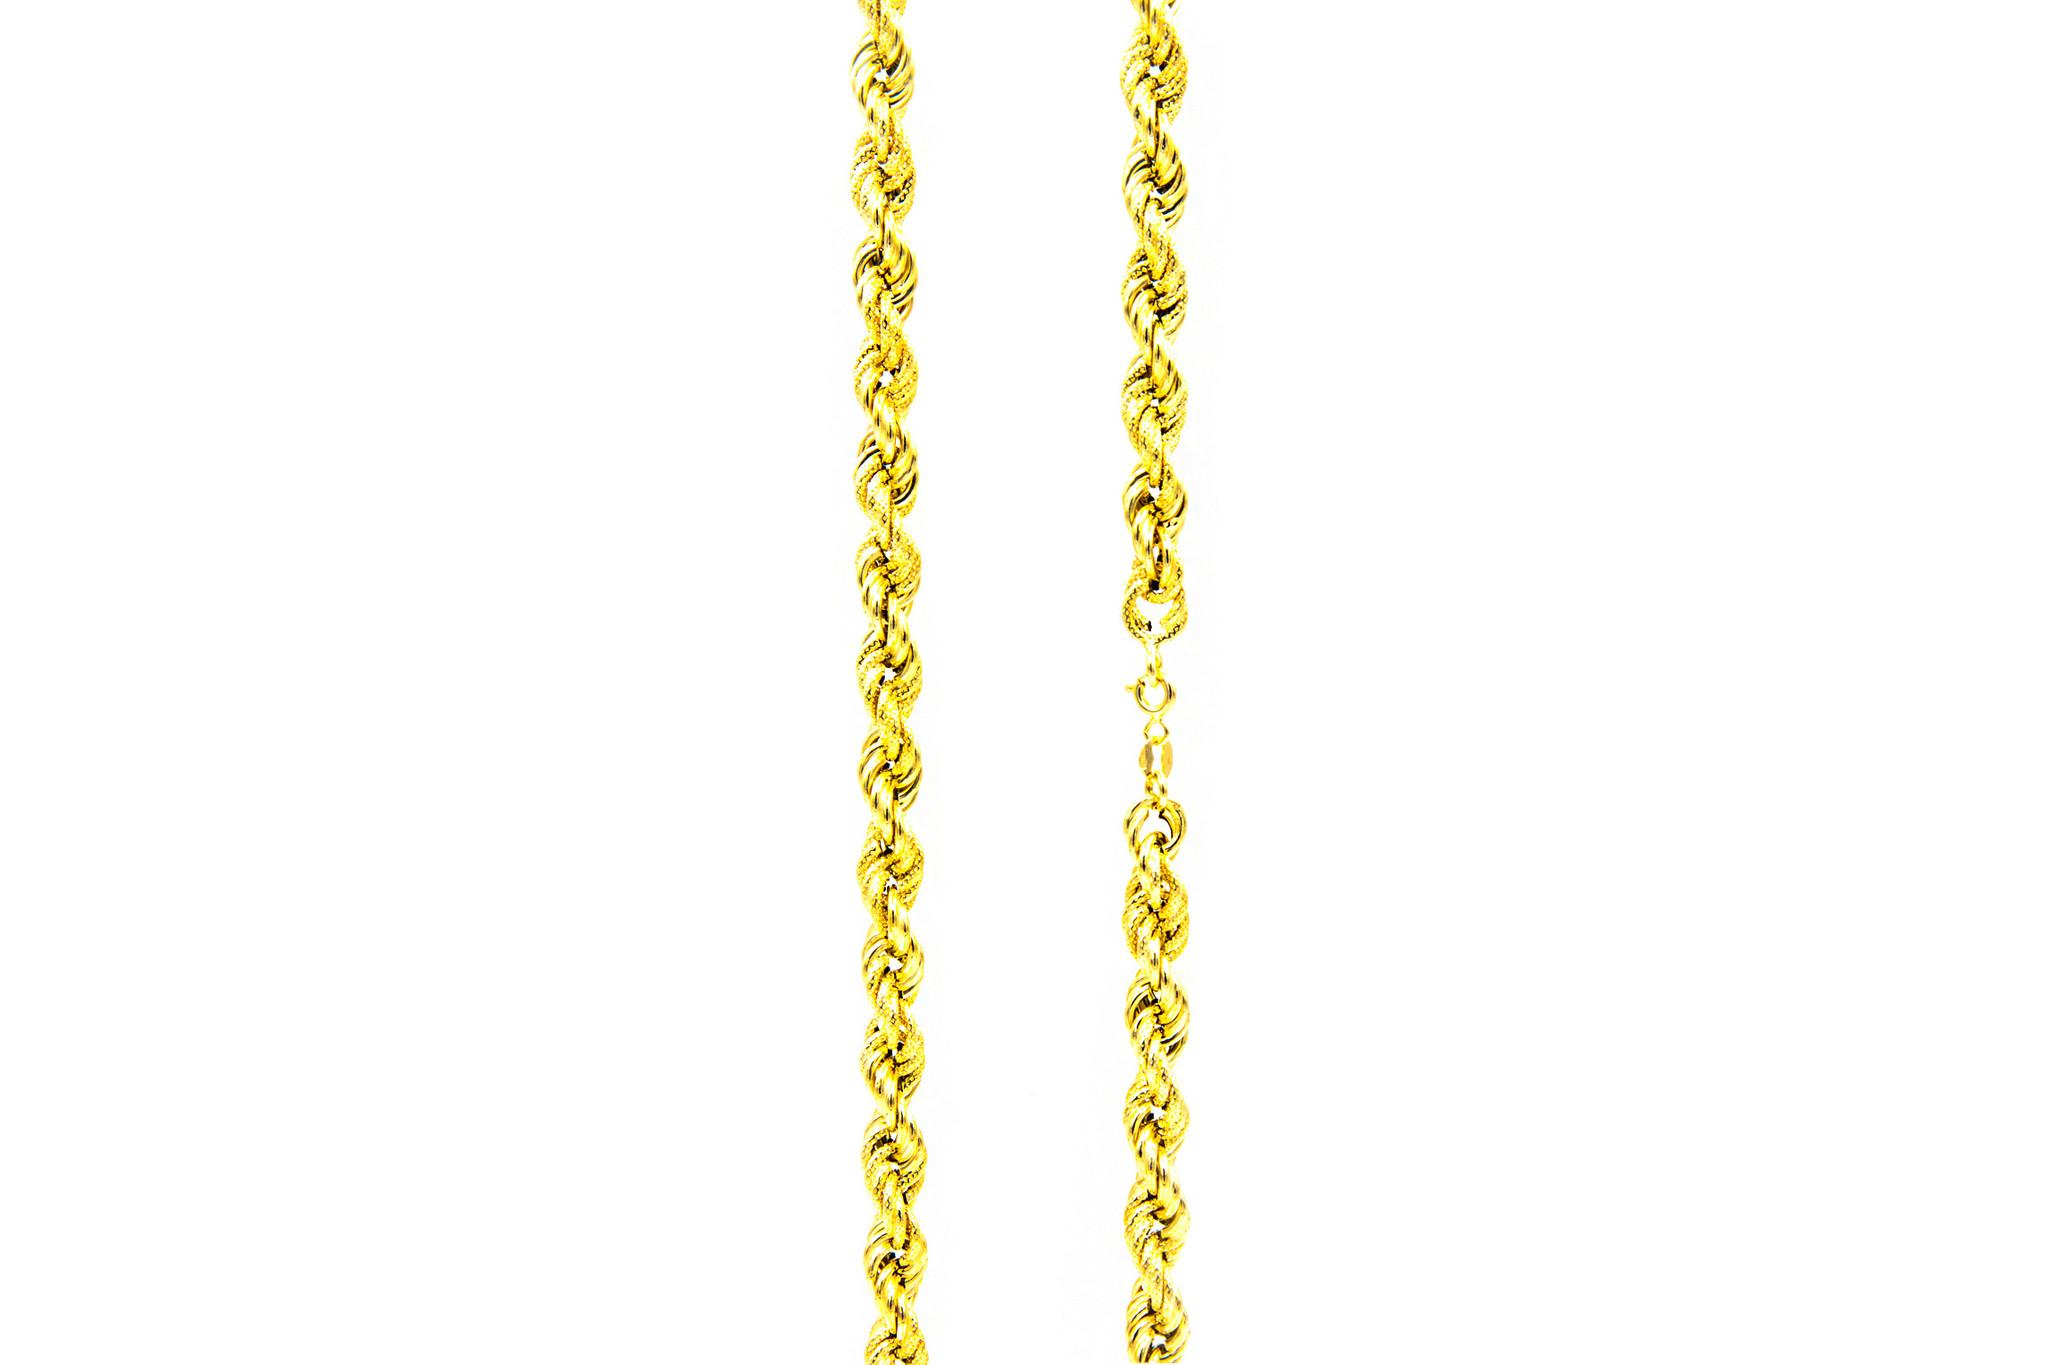 Ketting rope chain gedeeltelijk diamond cut-4